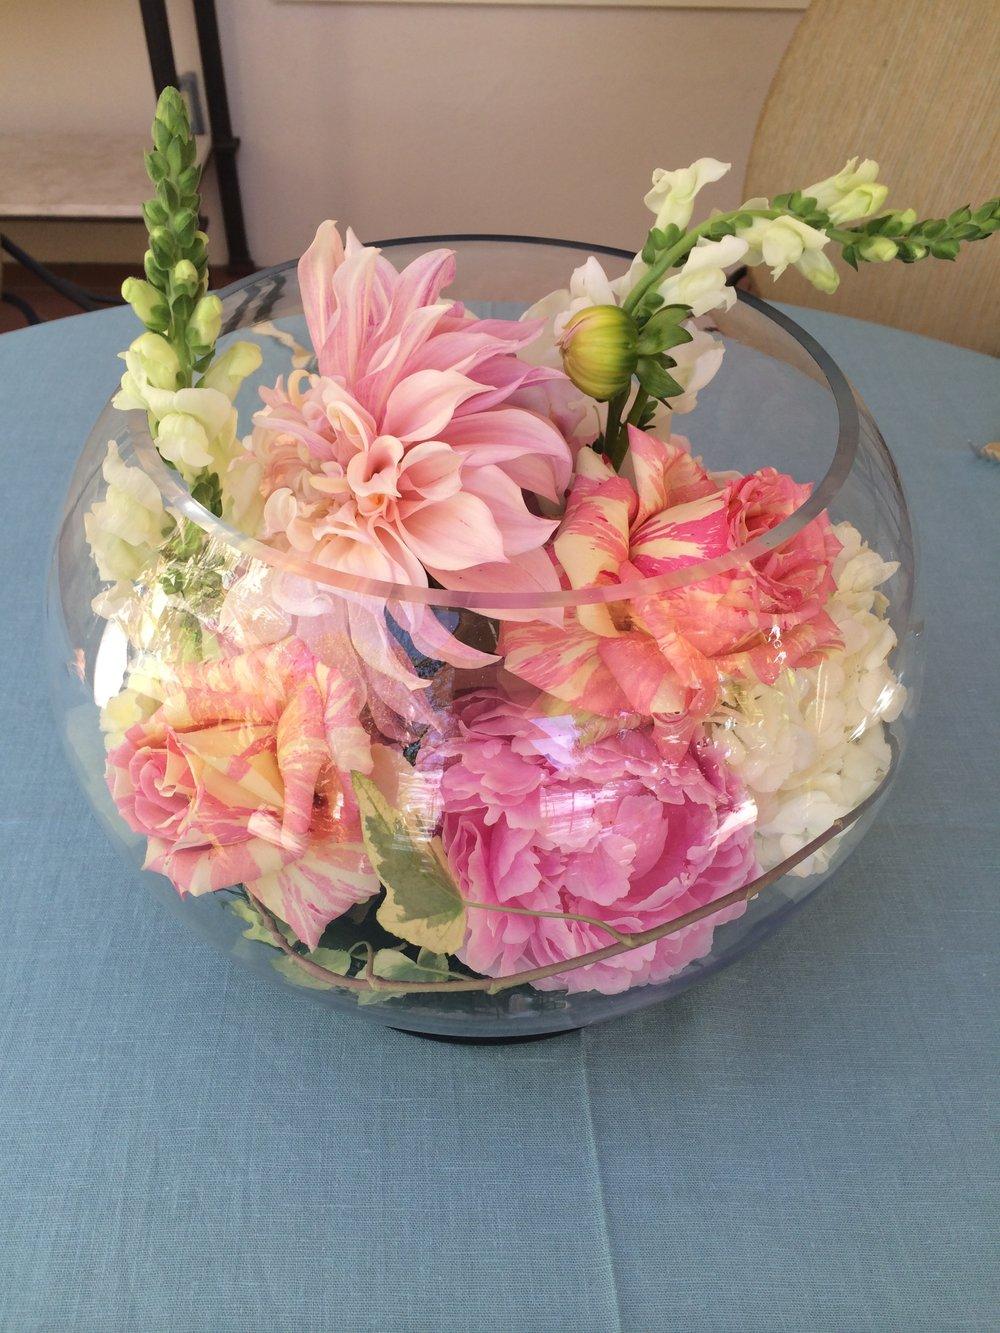 Dahlias-Pink-Fishbowl-Floral-Peonies.JPG